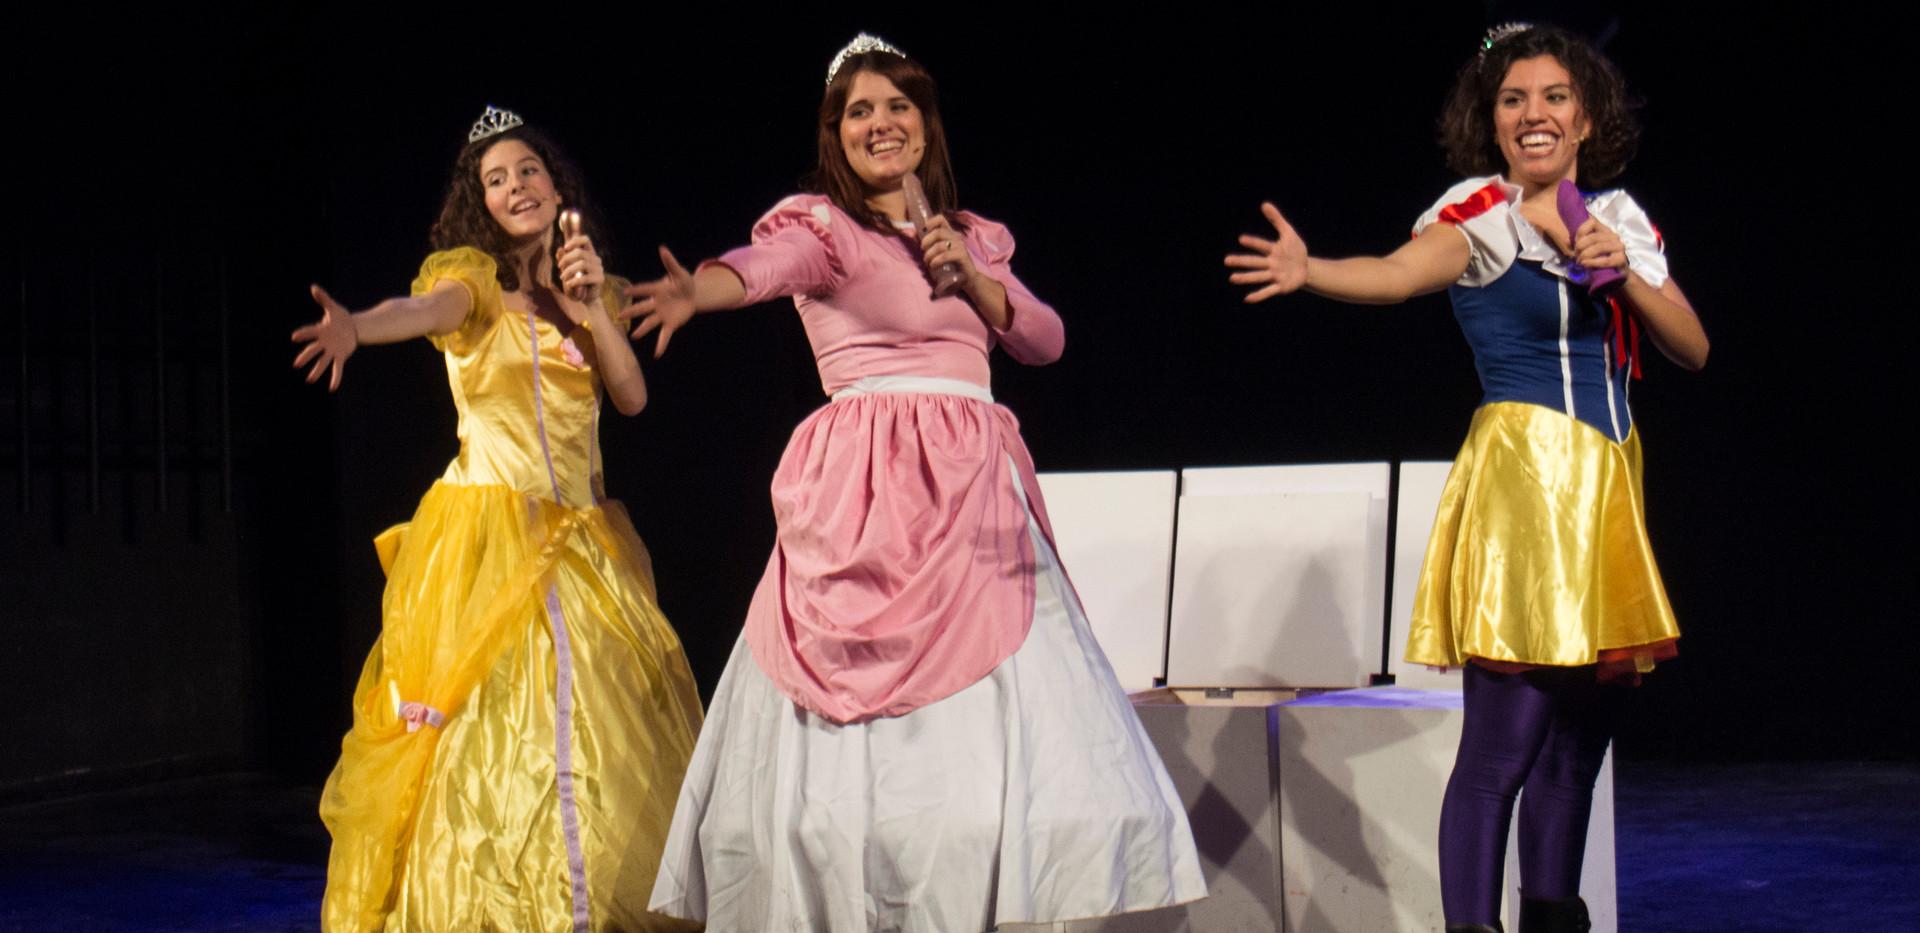 Princeses Fin.jpg